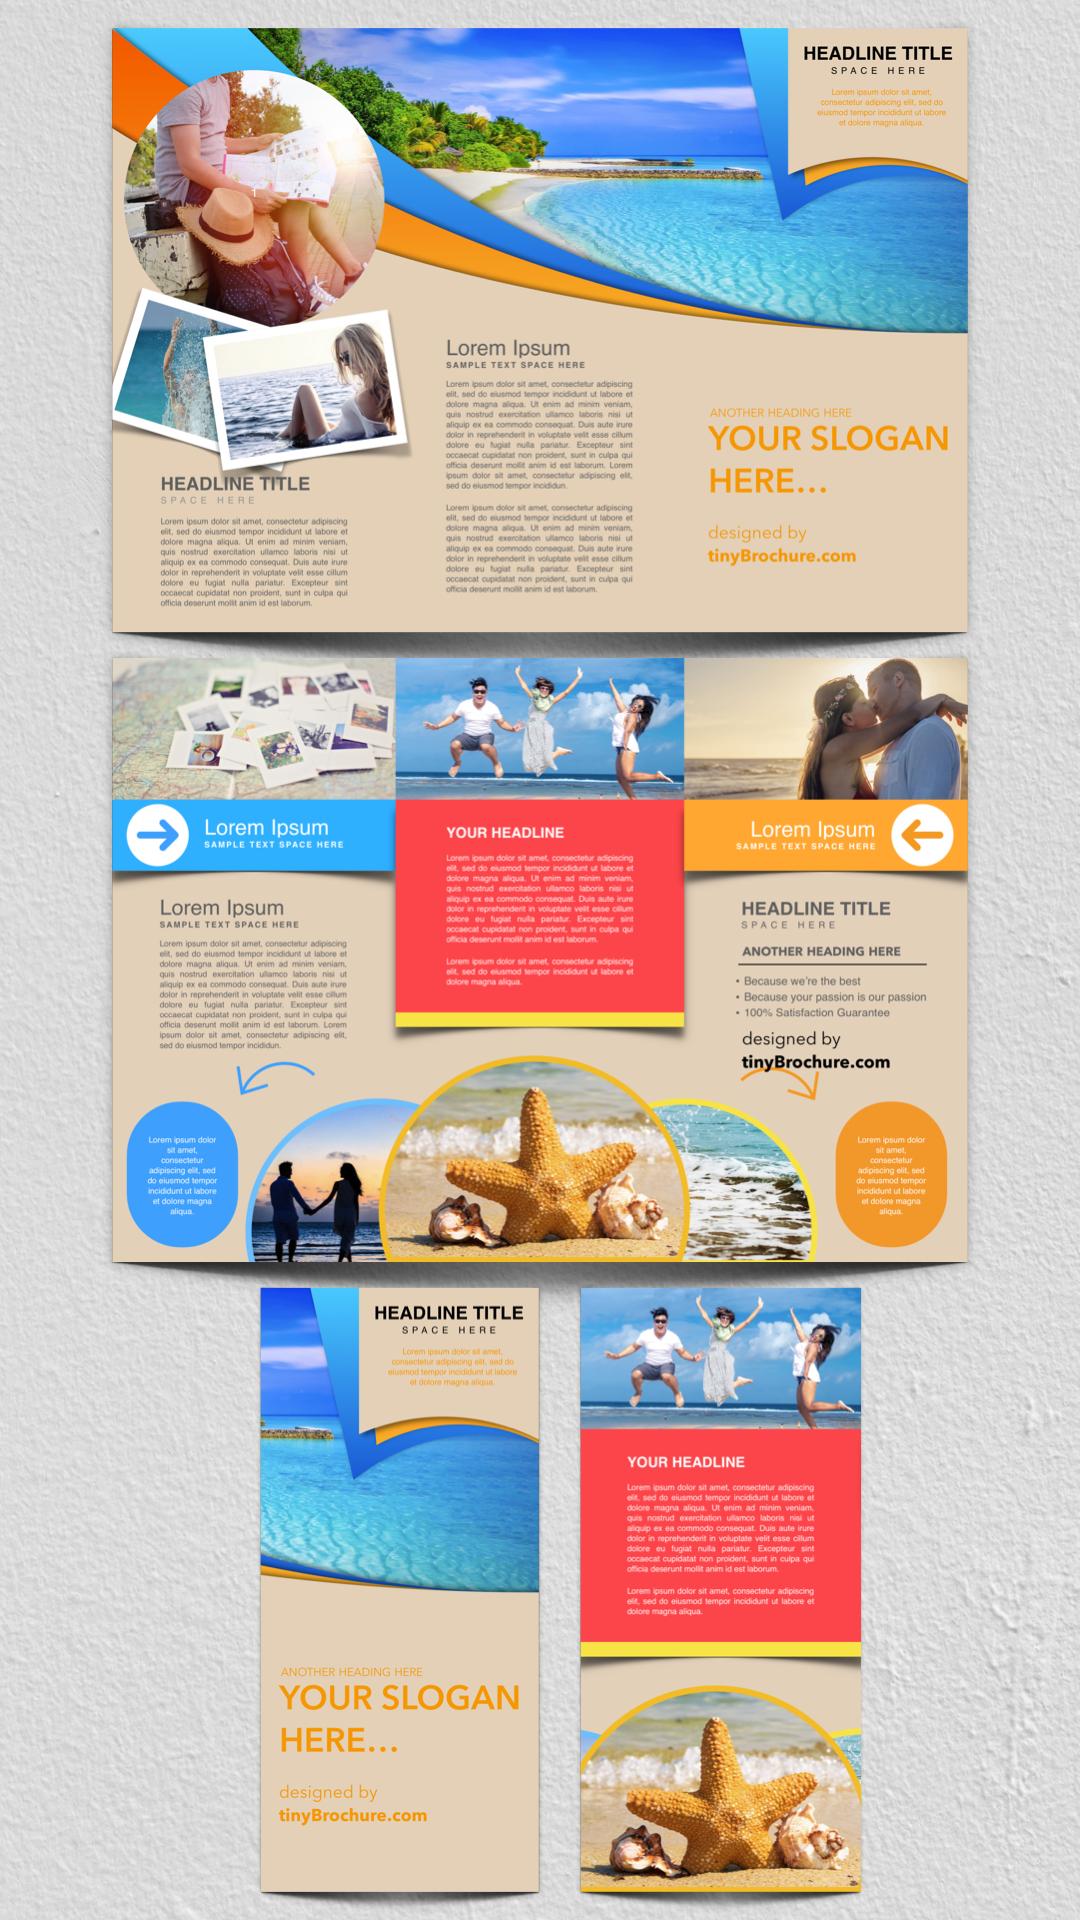 Travel Brochure Template Google Docs   Travel Brochure Throughout Travel Brochure Template Google Docs